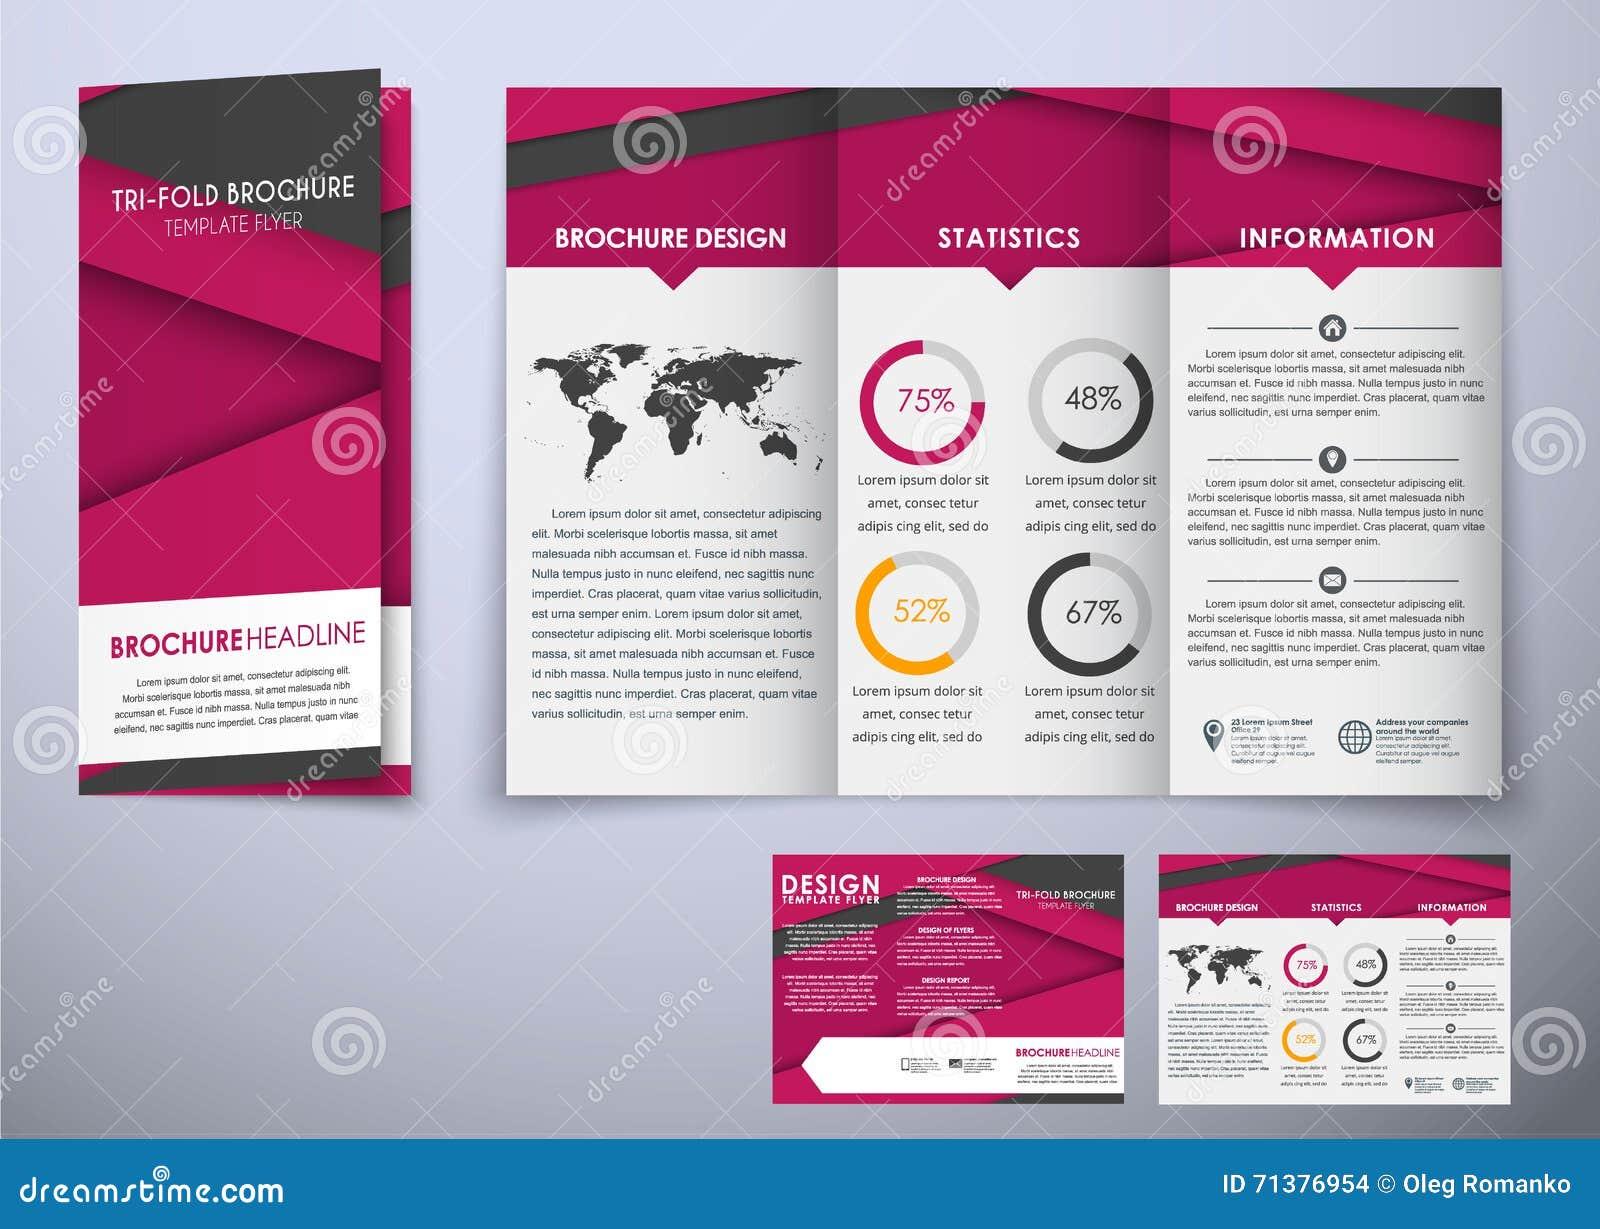 Template Triple Folding Brochure Design Style Material Stock ...